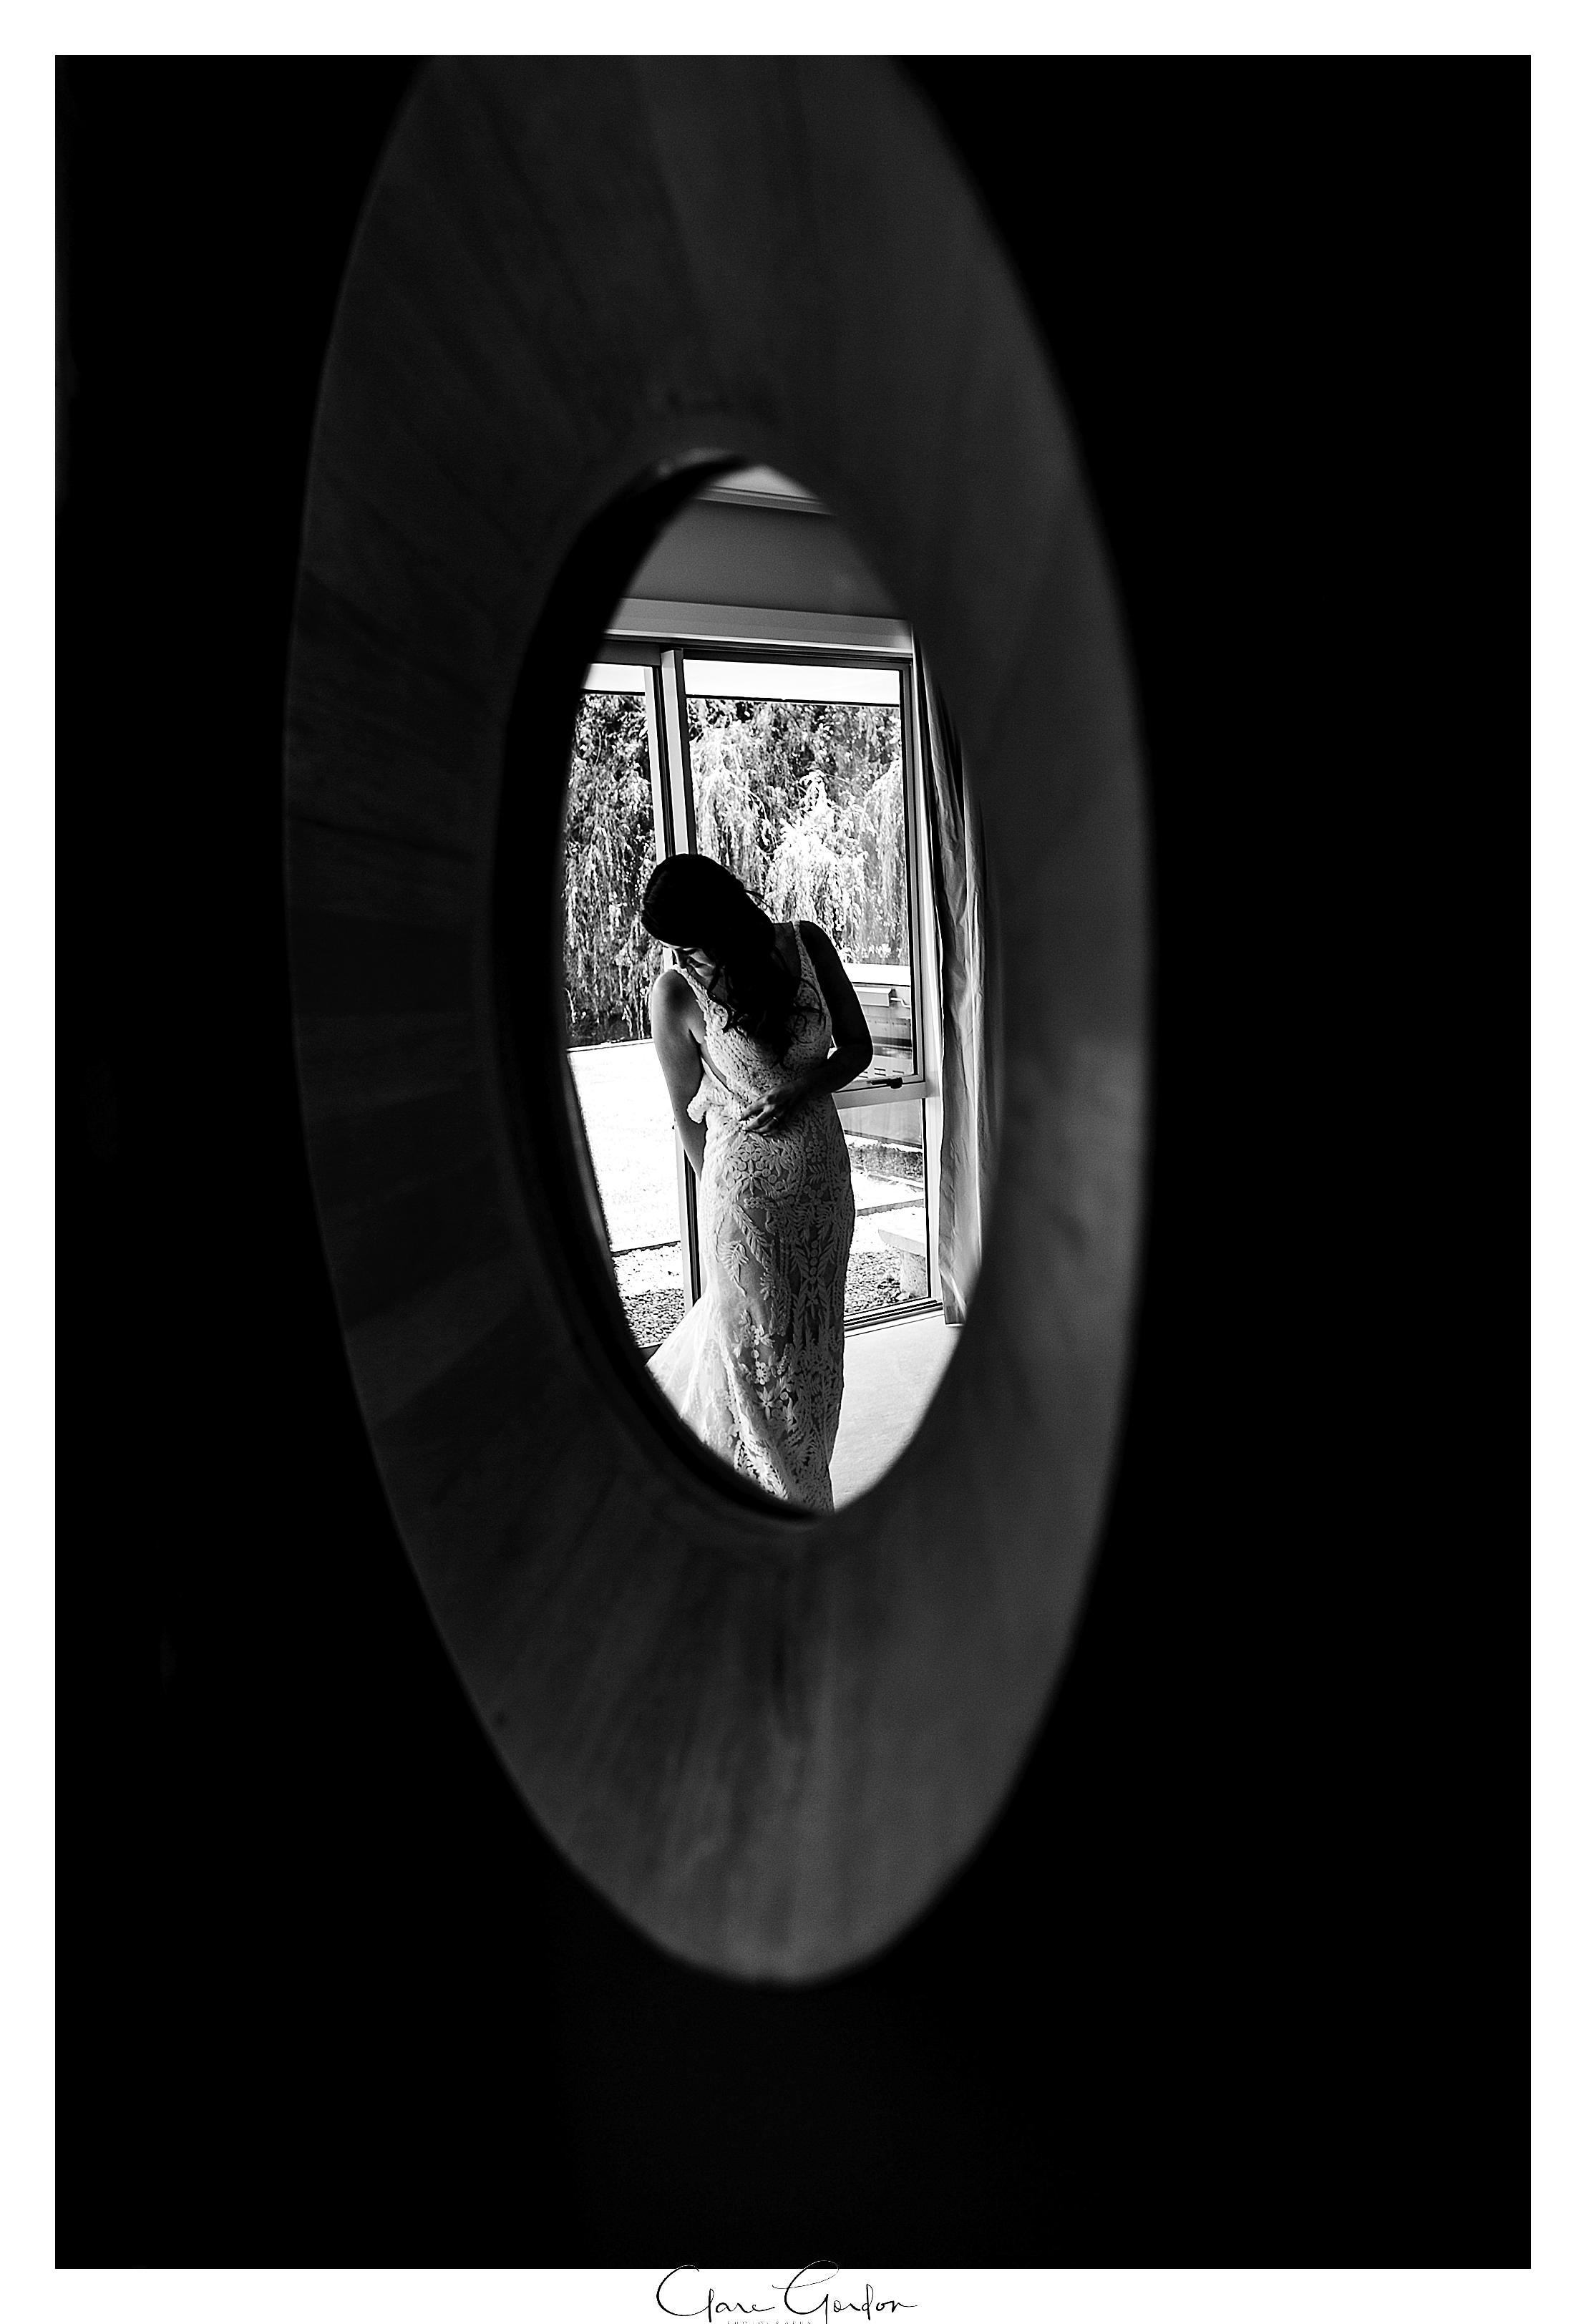 Bride-portrait-reflection-in-mirror